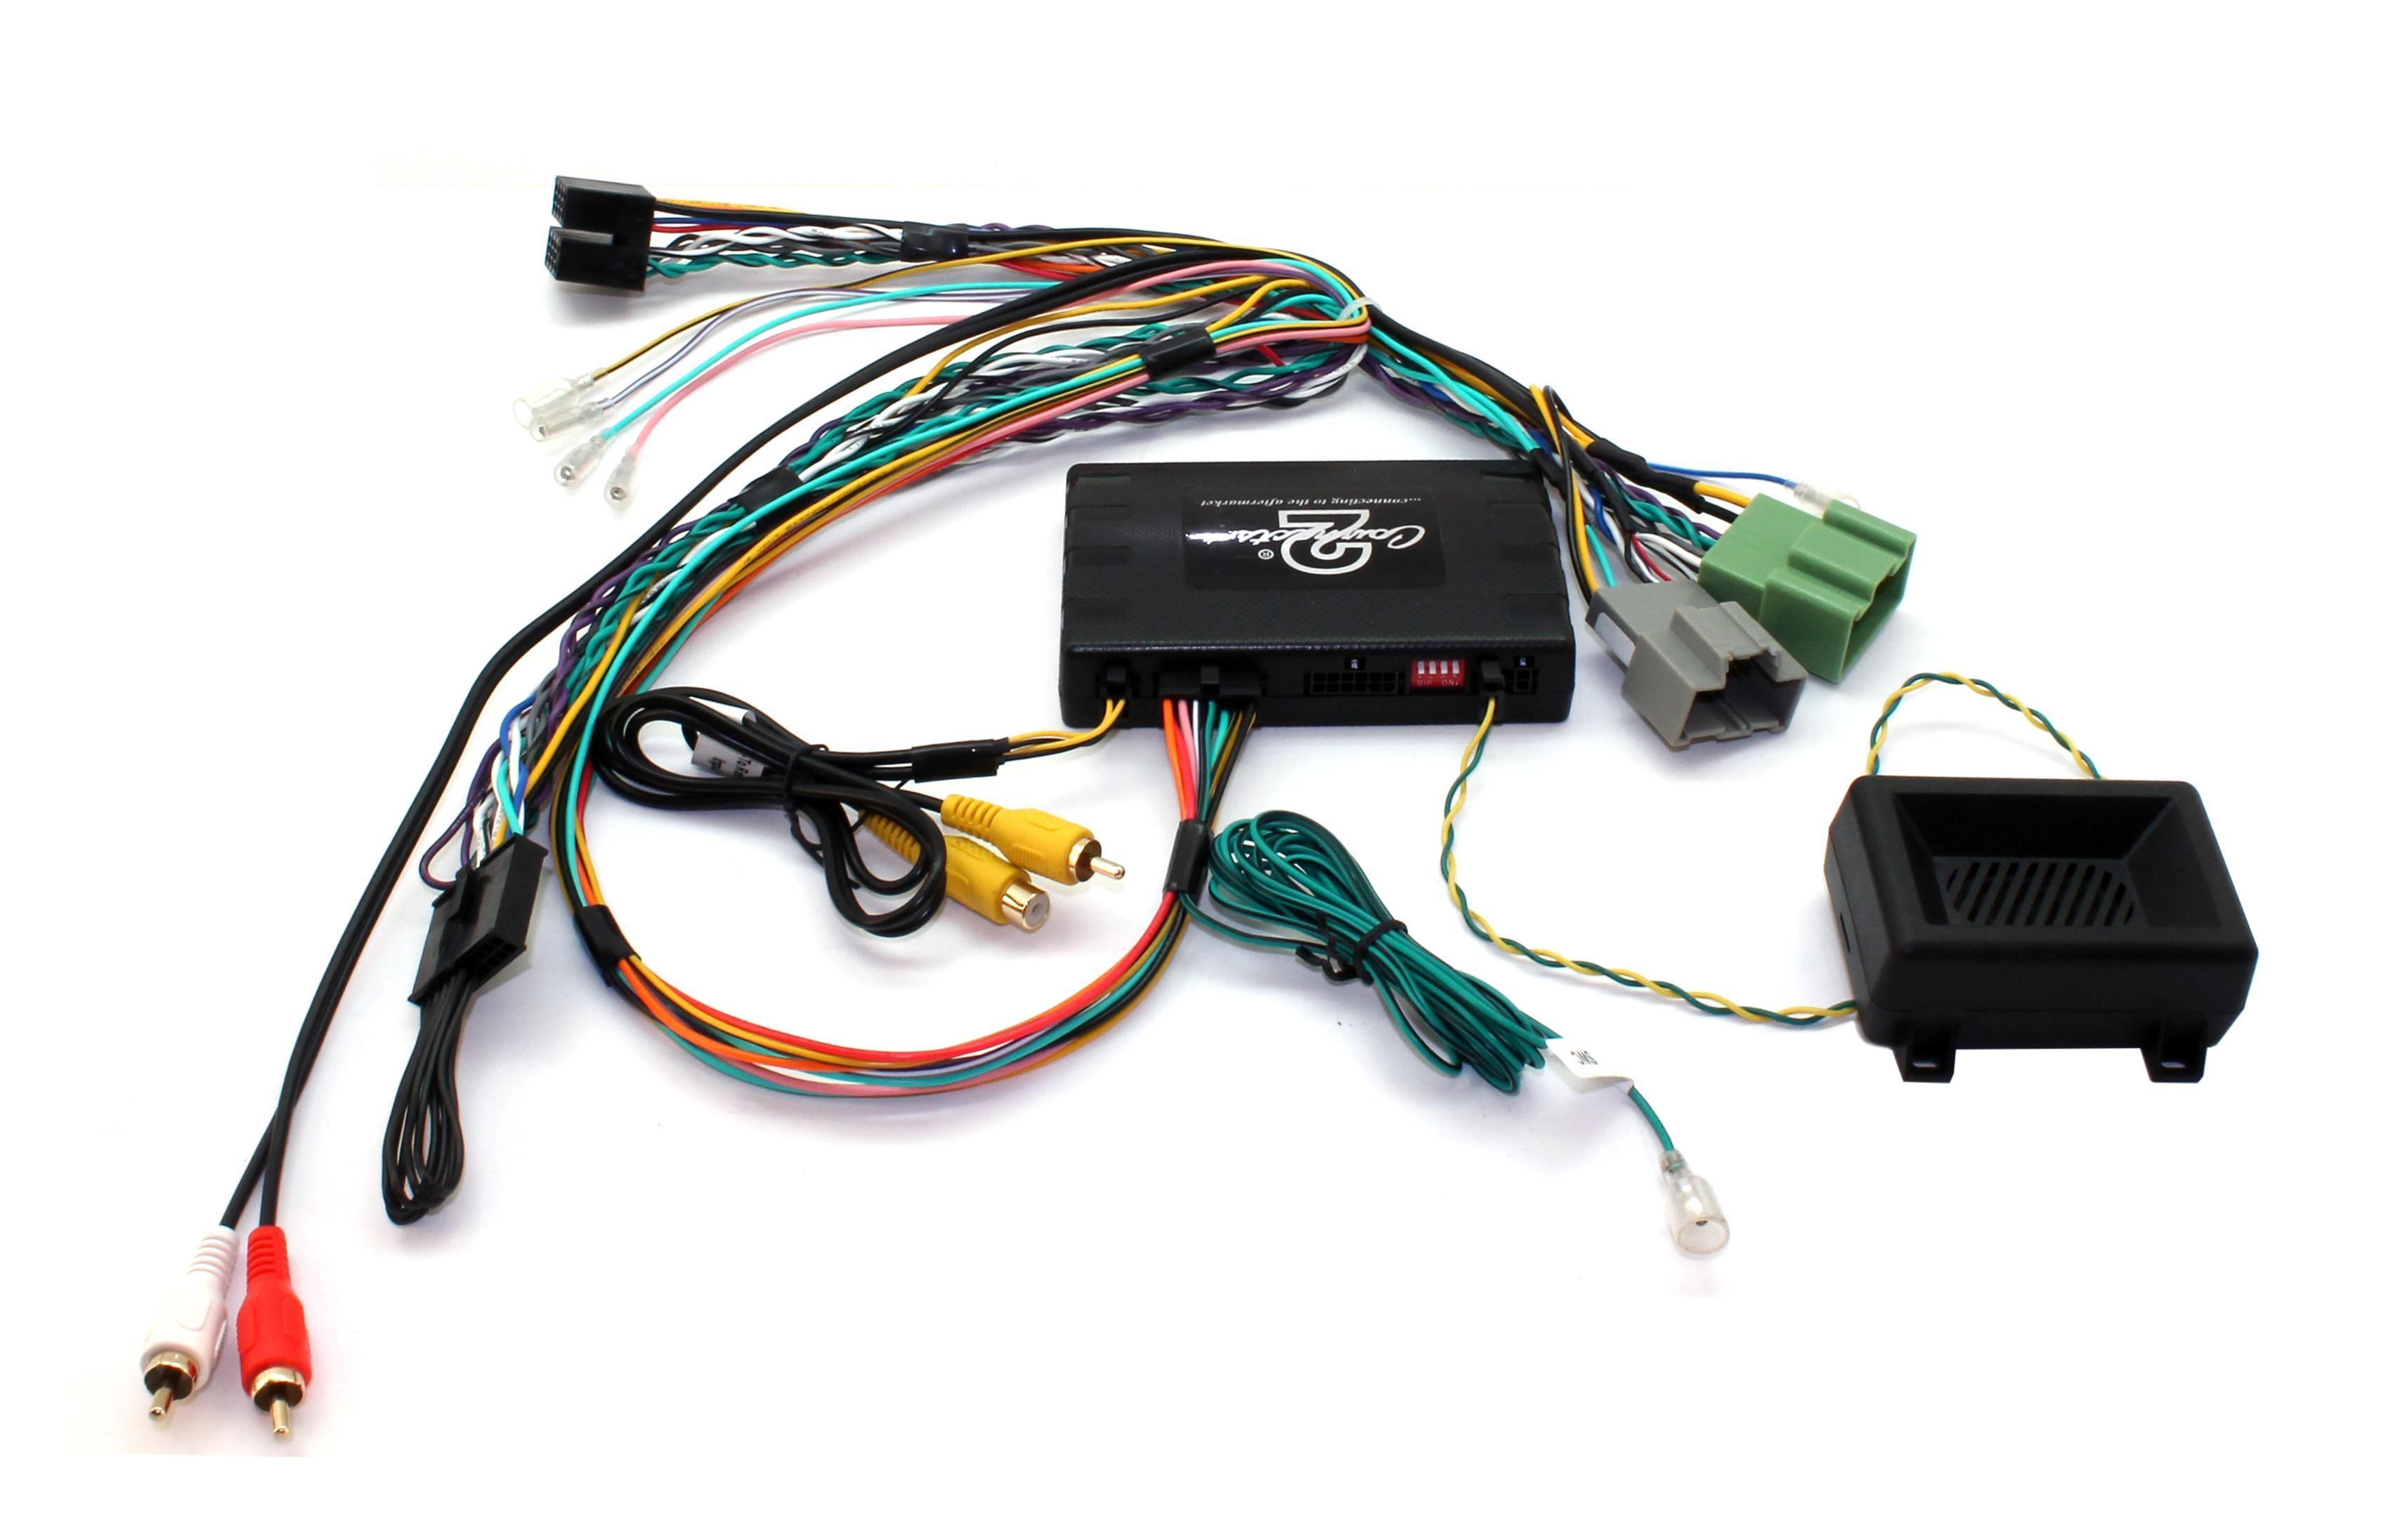 Can-адаптер к магнитоле своими руками 882